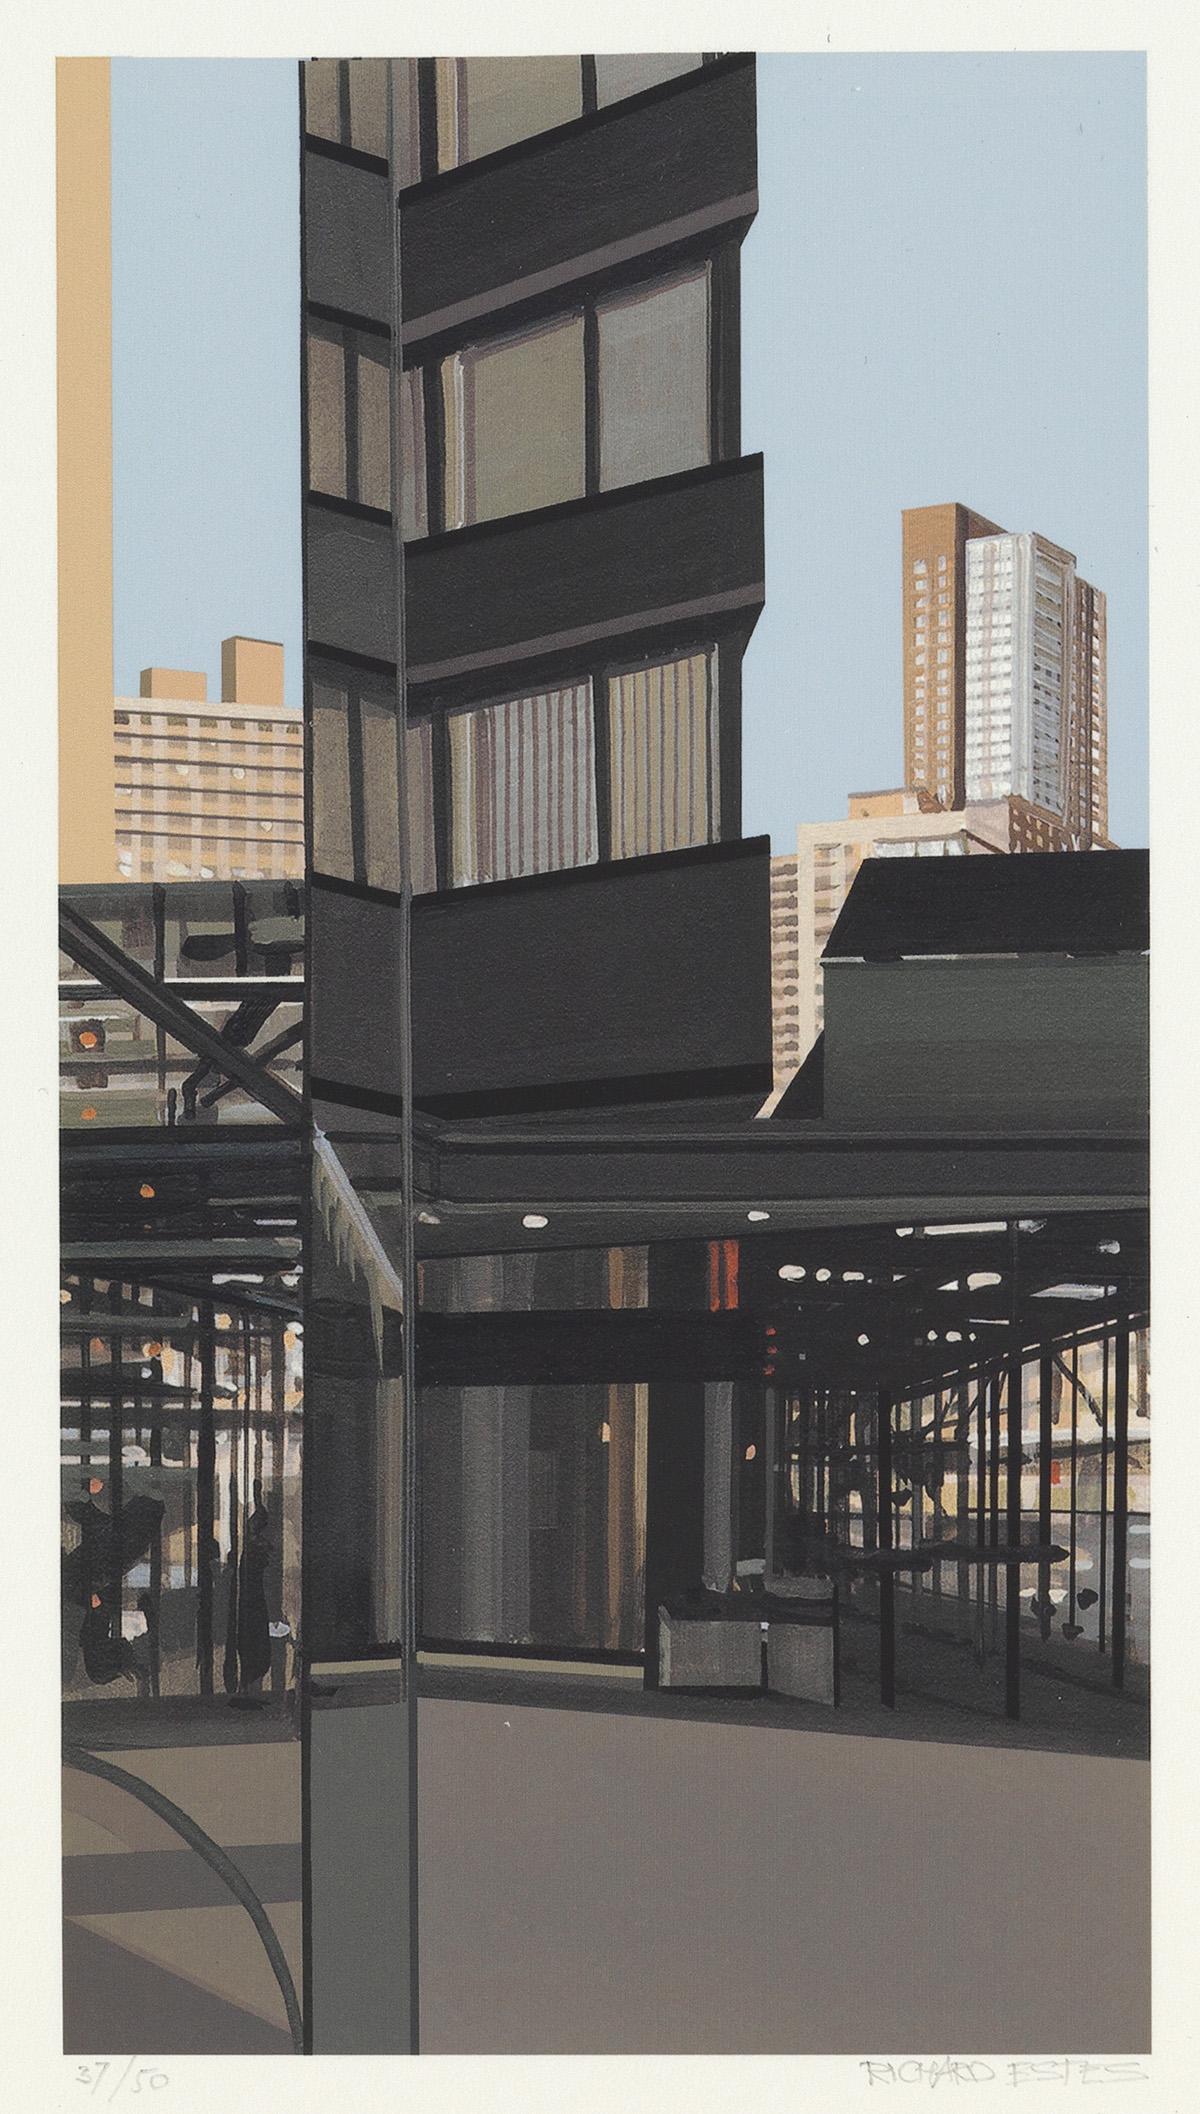 RICHARD-ESTES-Print-from-Portfolio-Hommage-à-Domberger